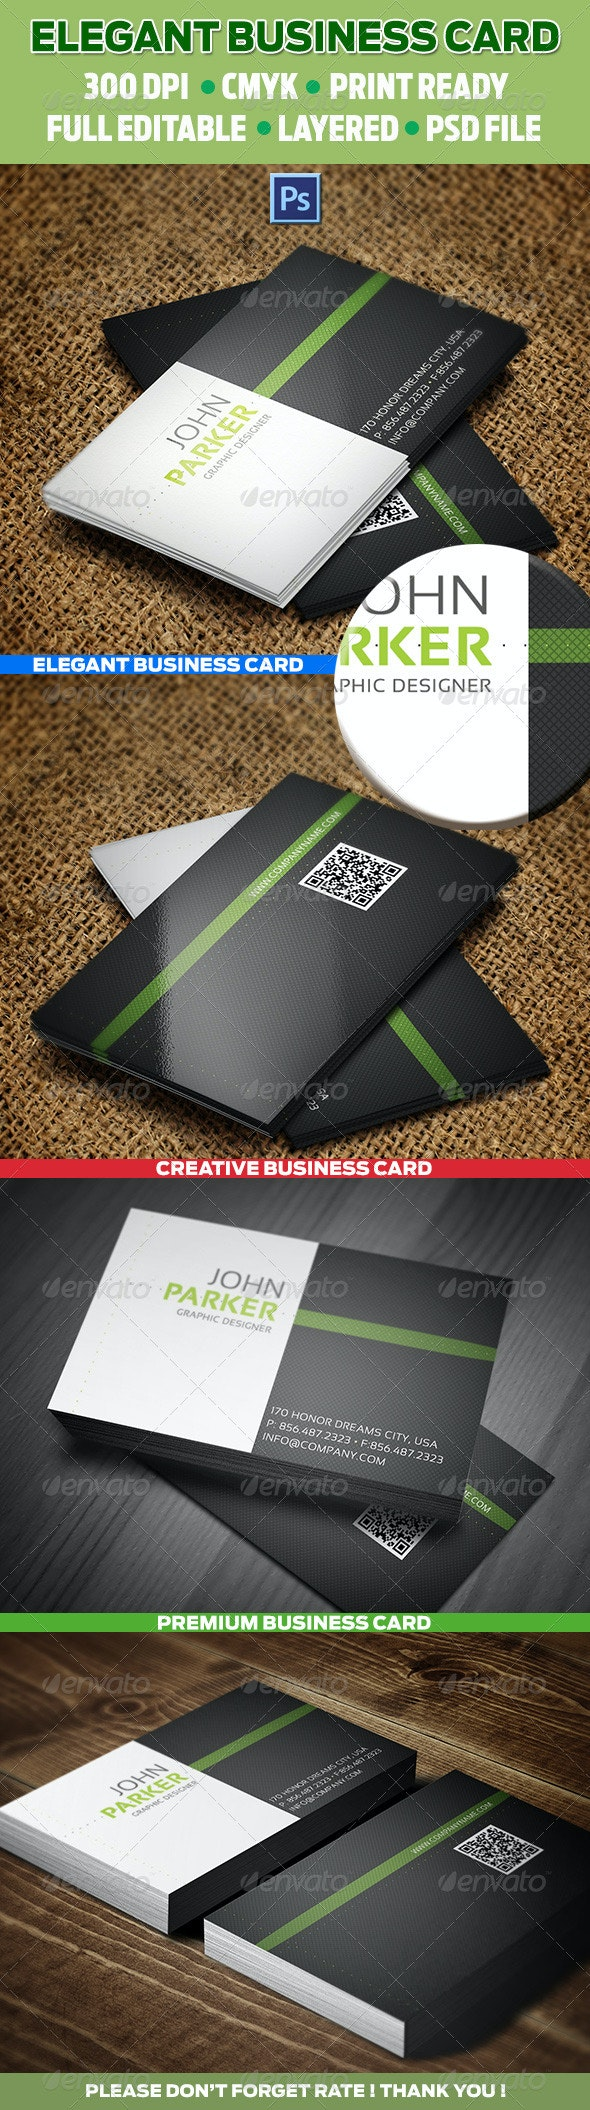 Creative Business Cards 15 - Creative Business Cards